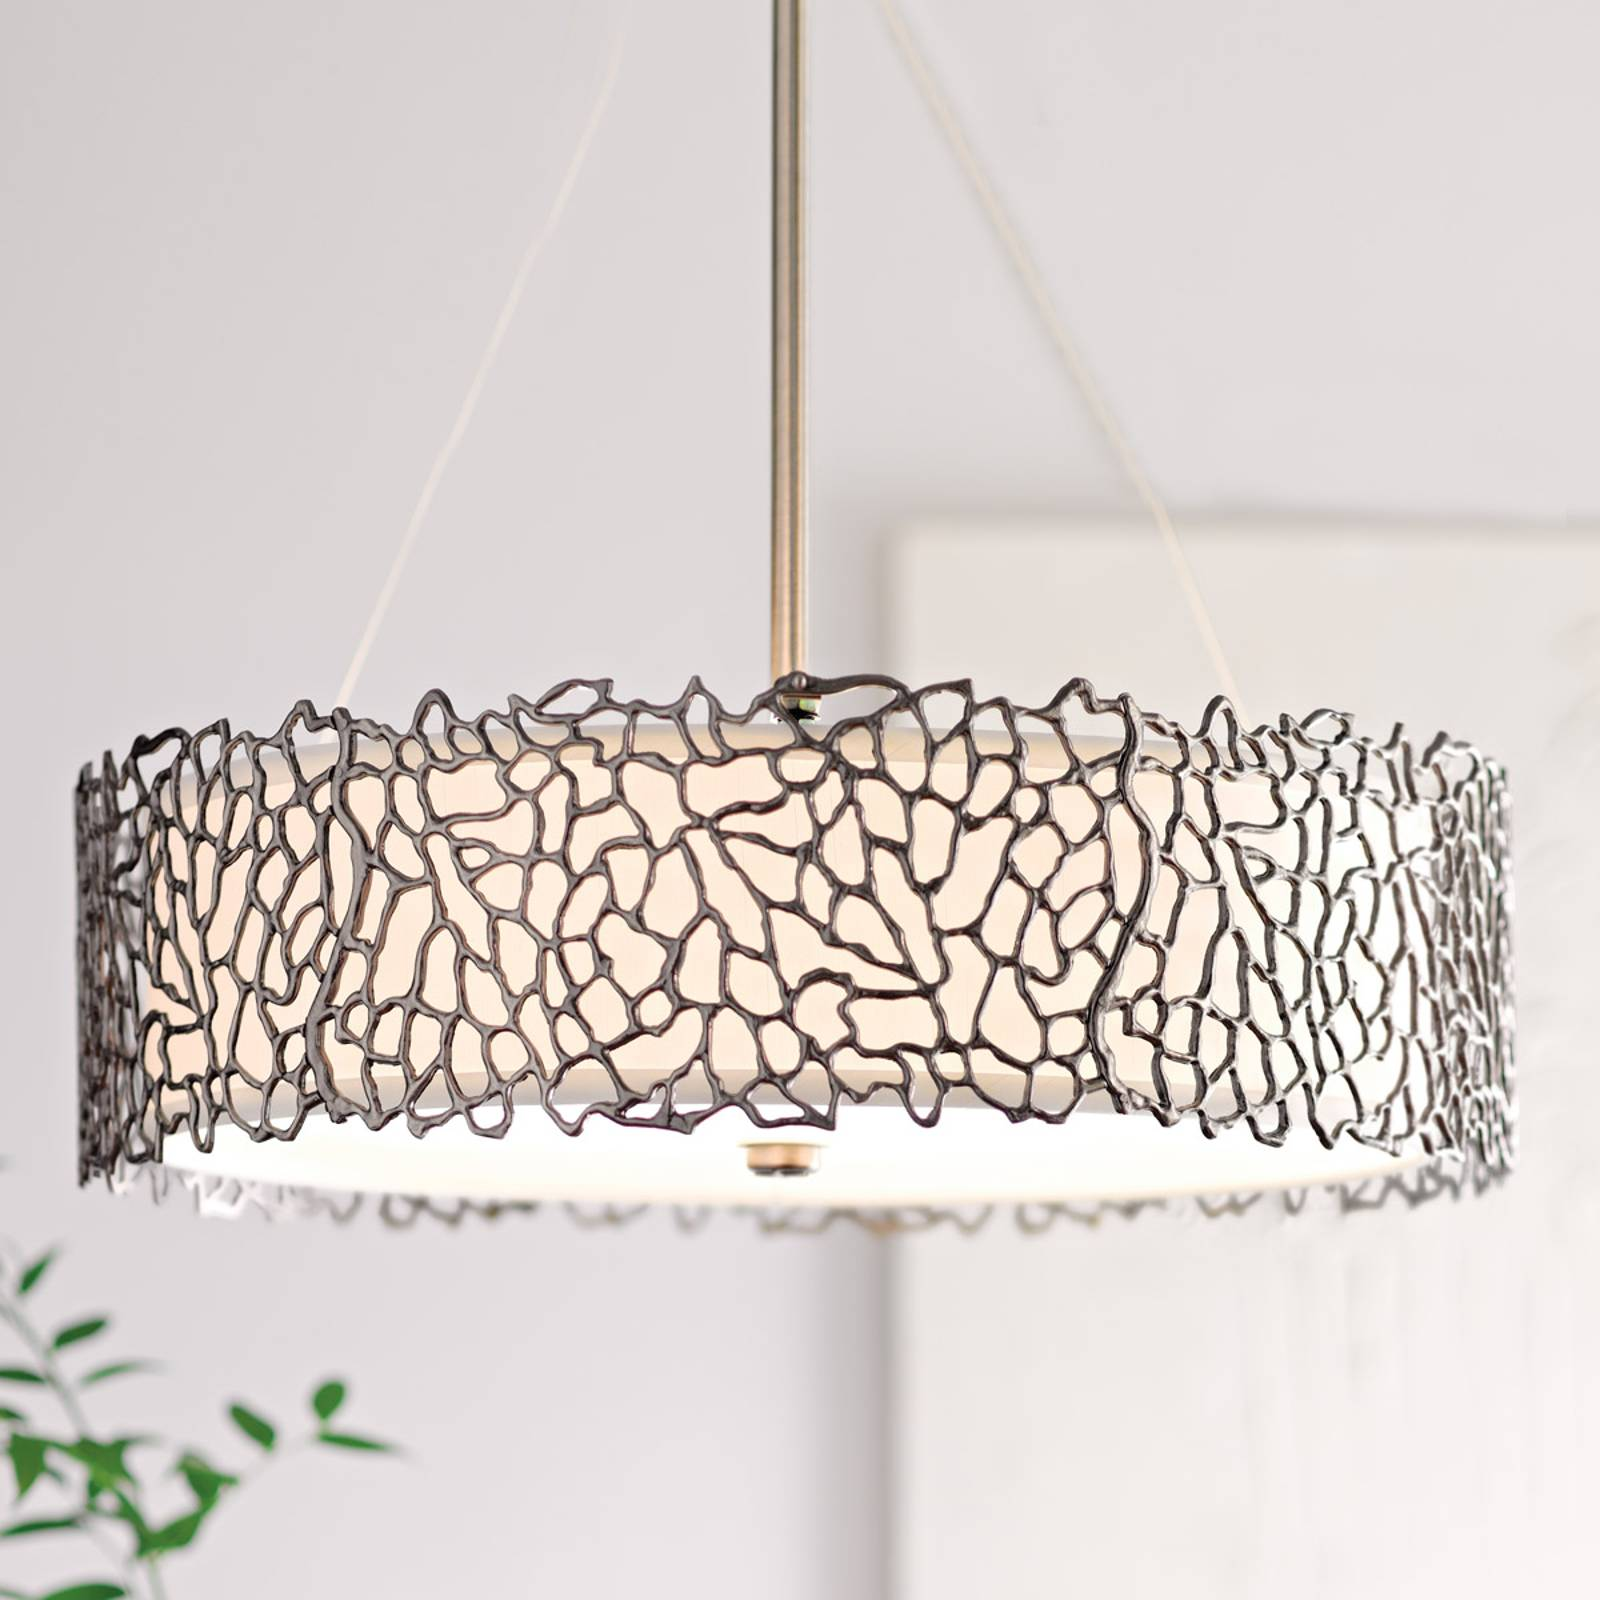 Hanglamp Silver Coral 55,9 cm